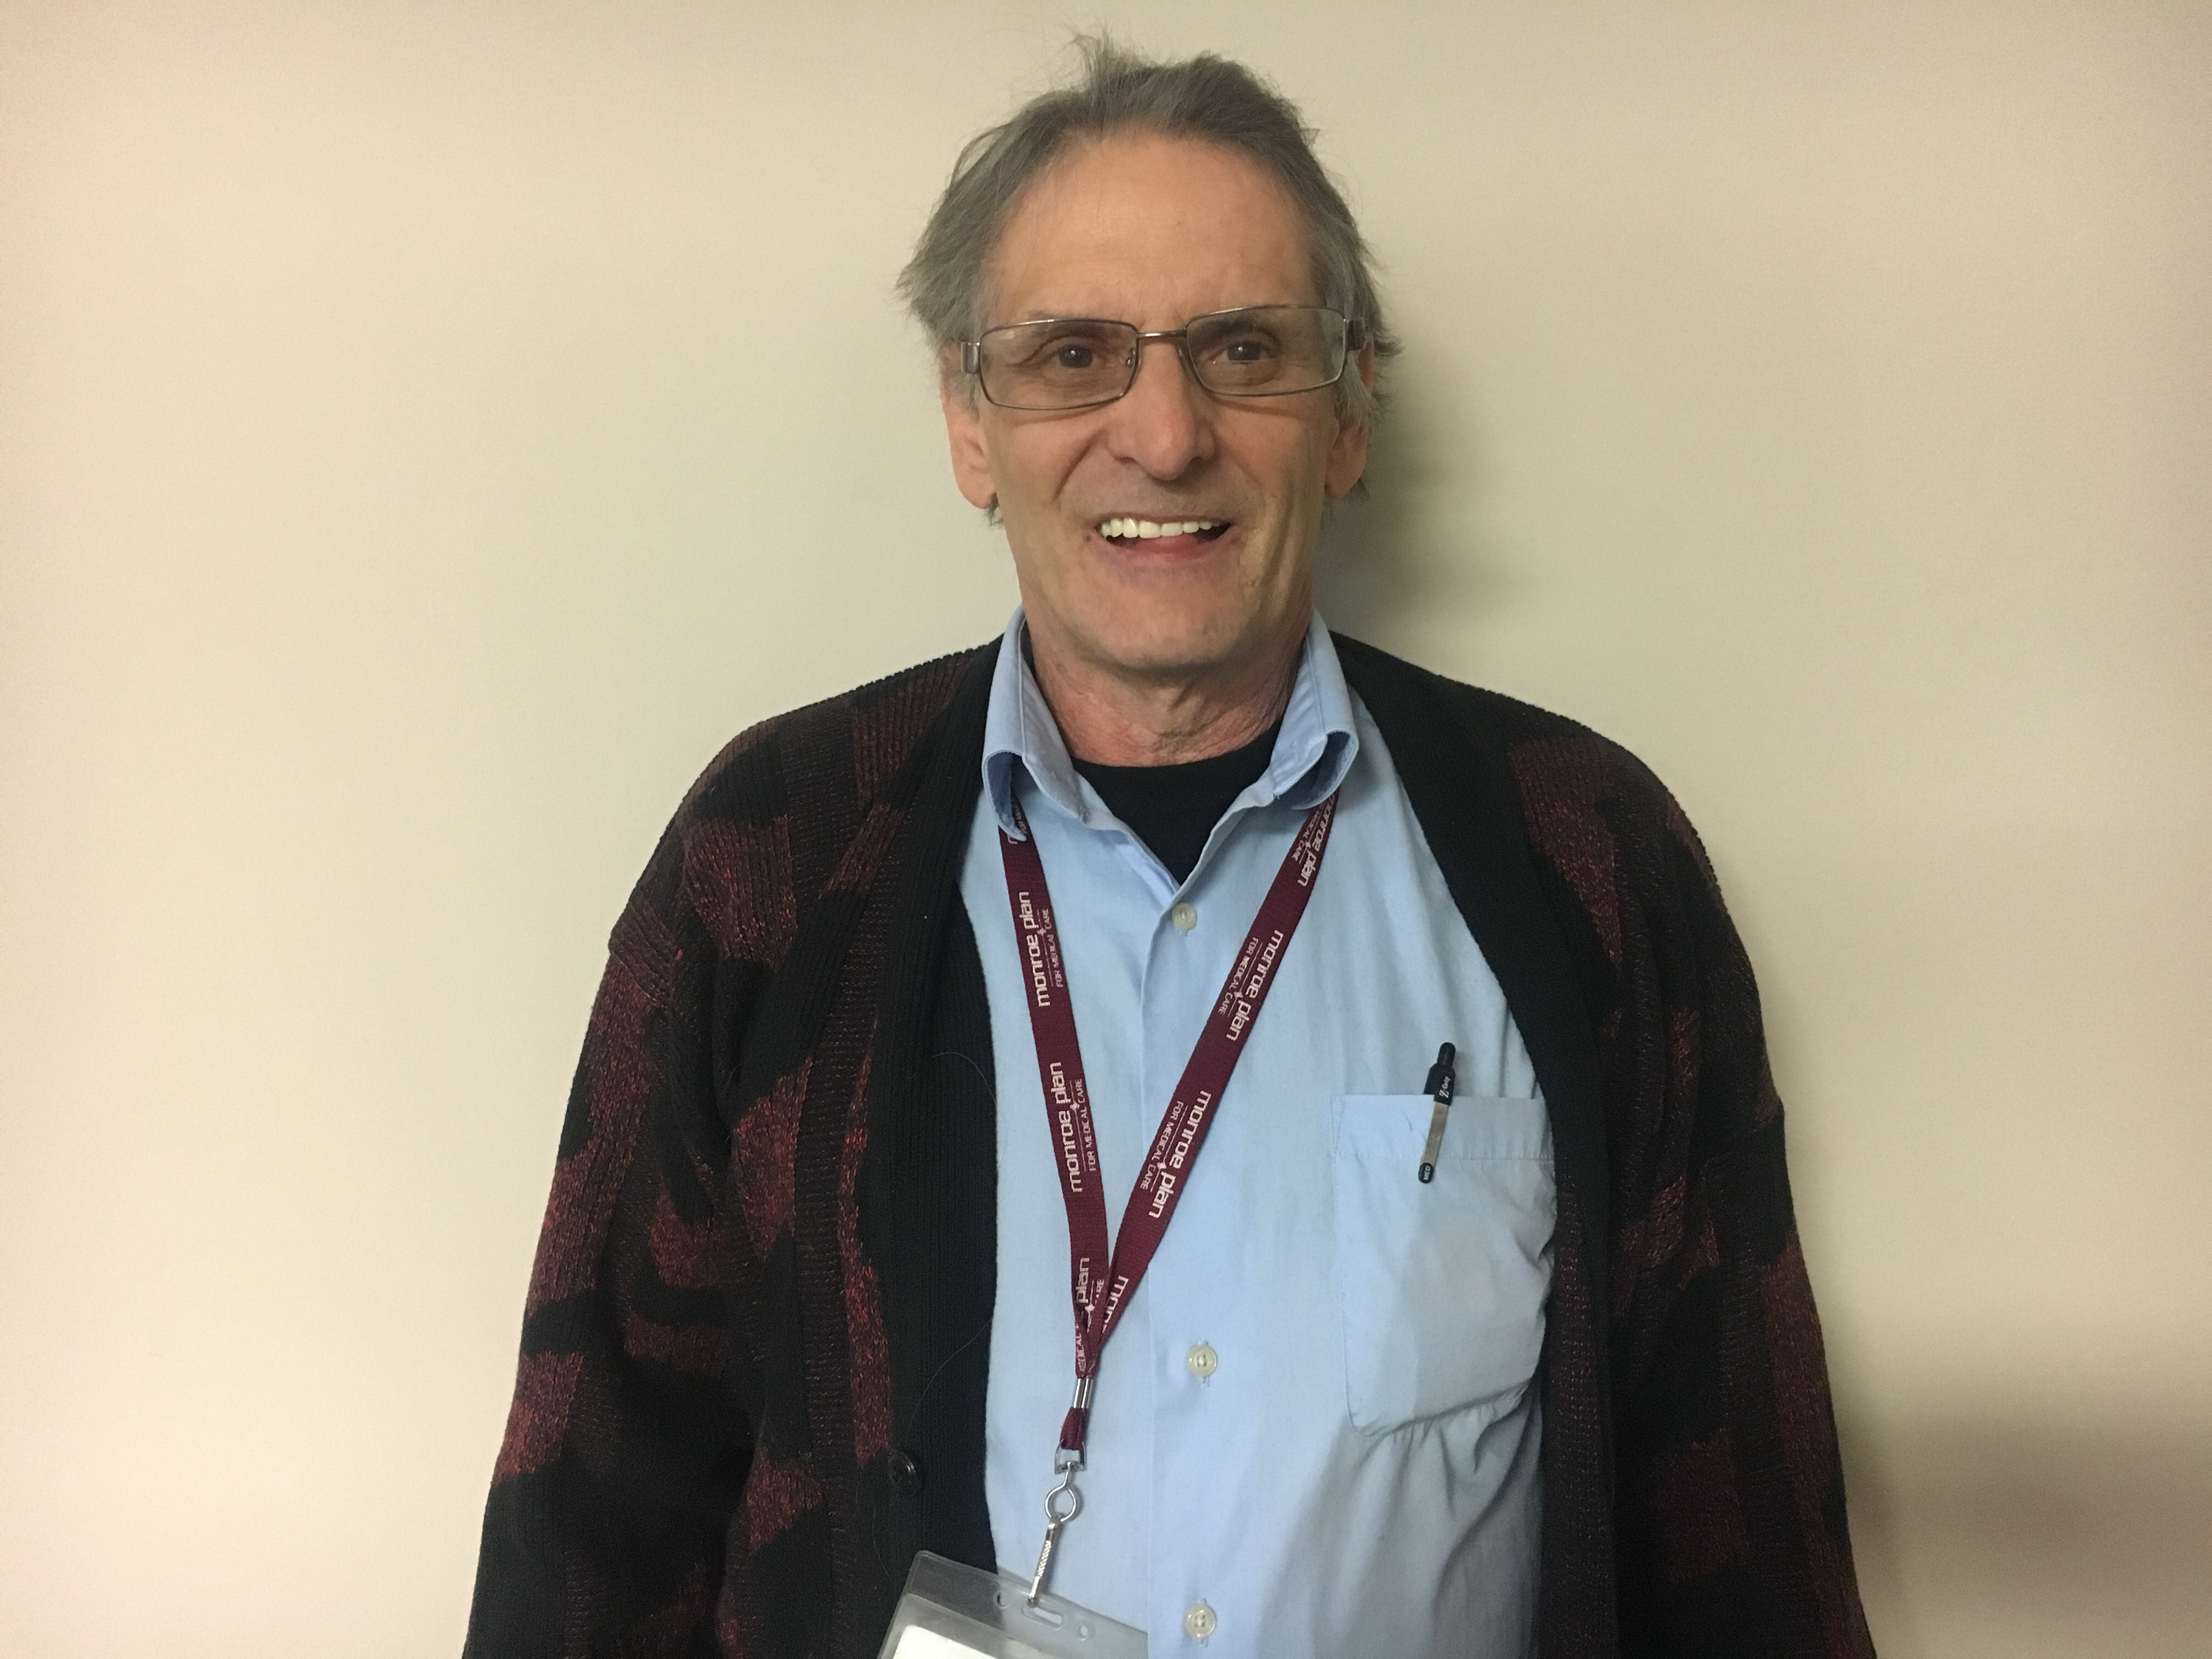 Lawrence Nowell - Member